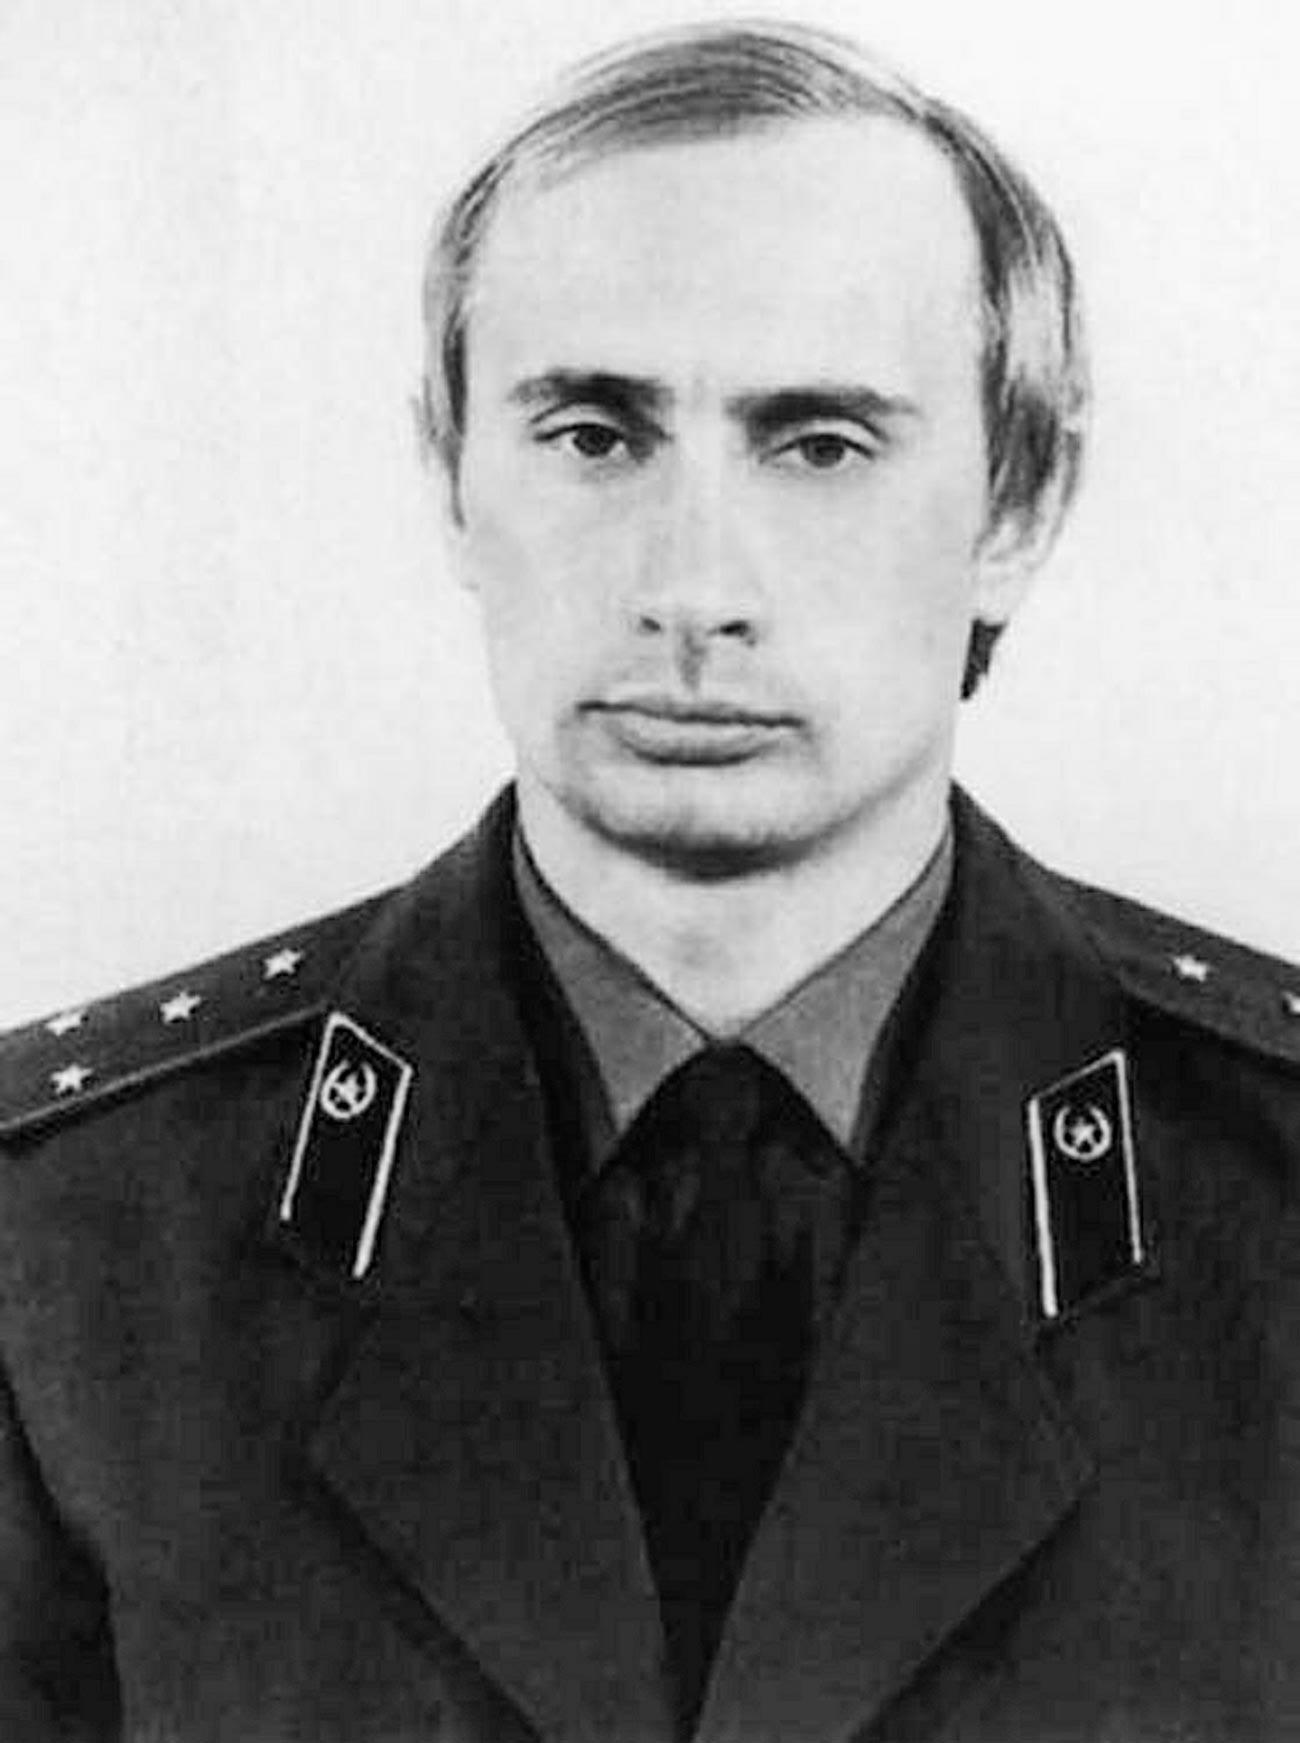 Mladi Vladimir Putin u uniformi KGB-a.